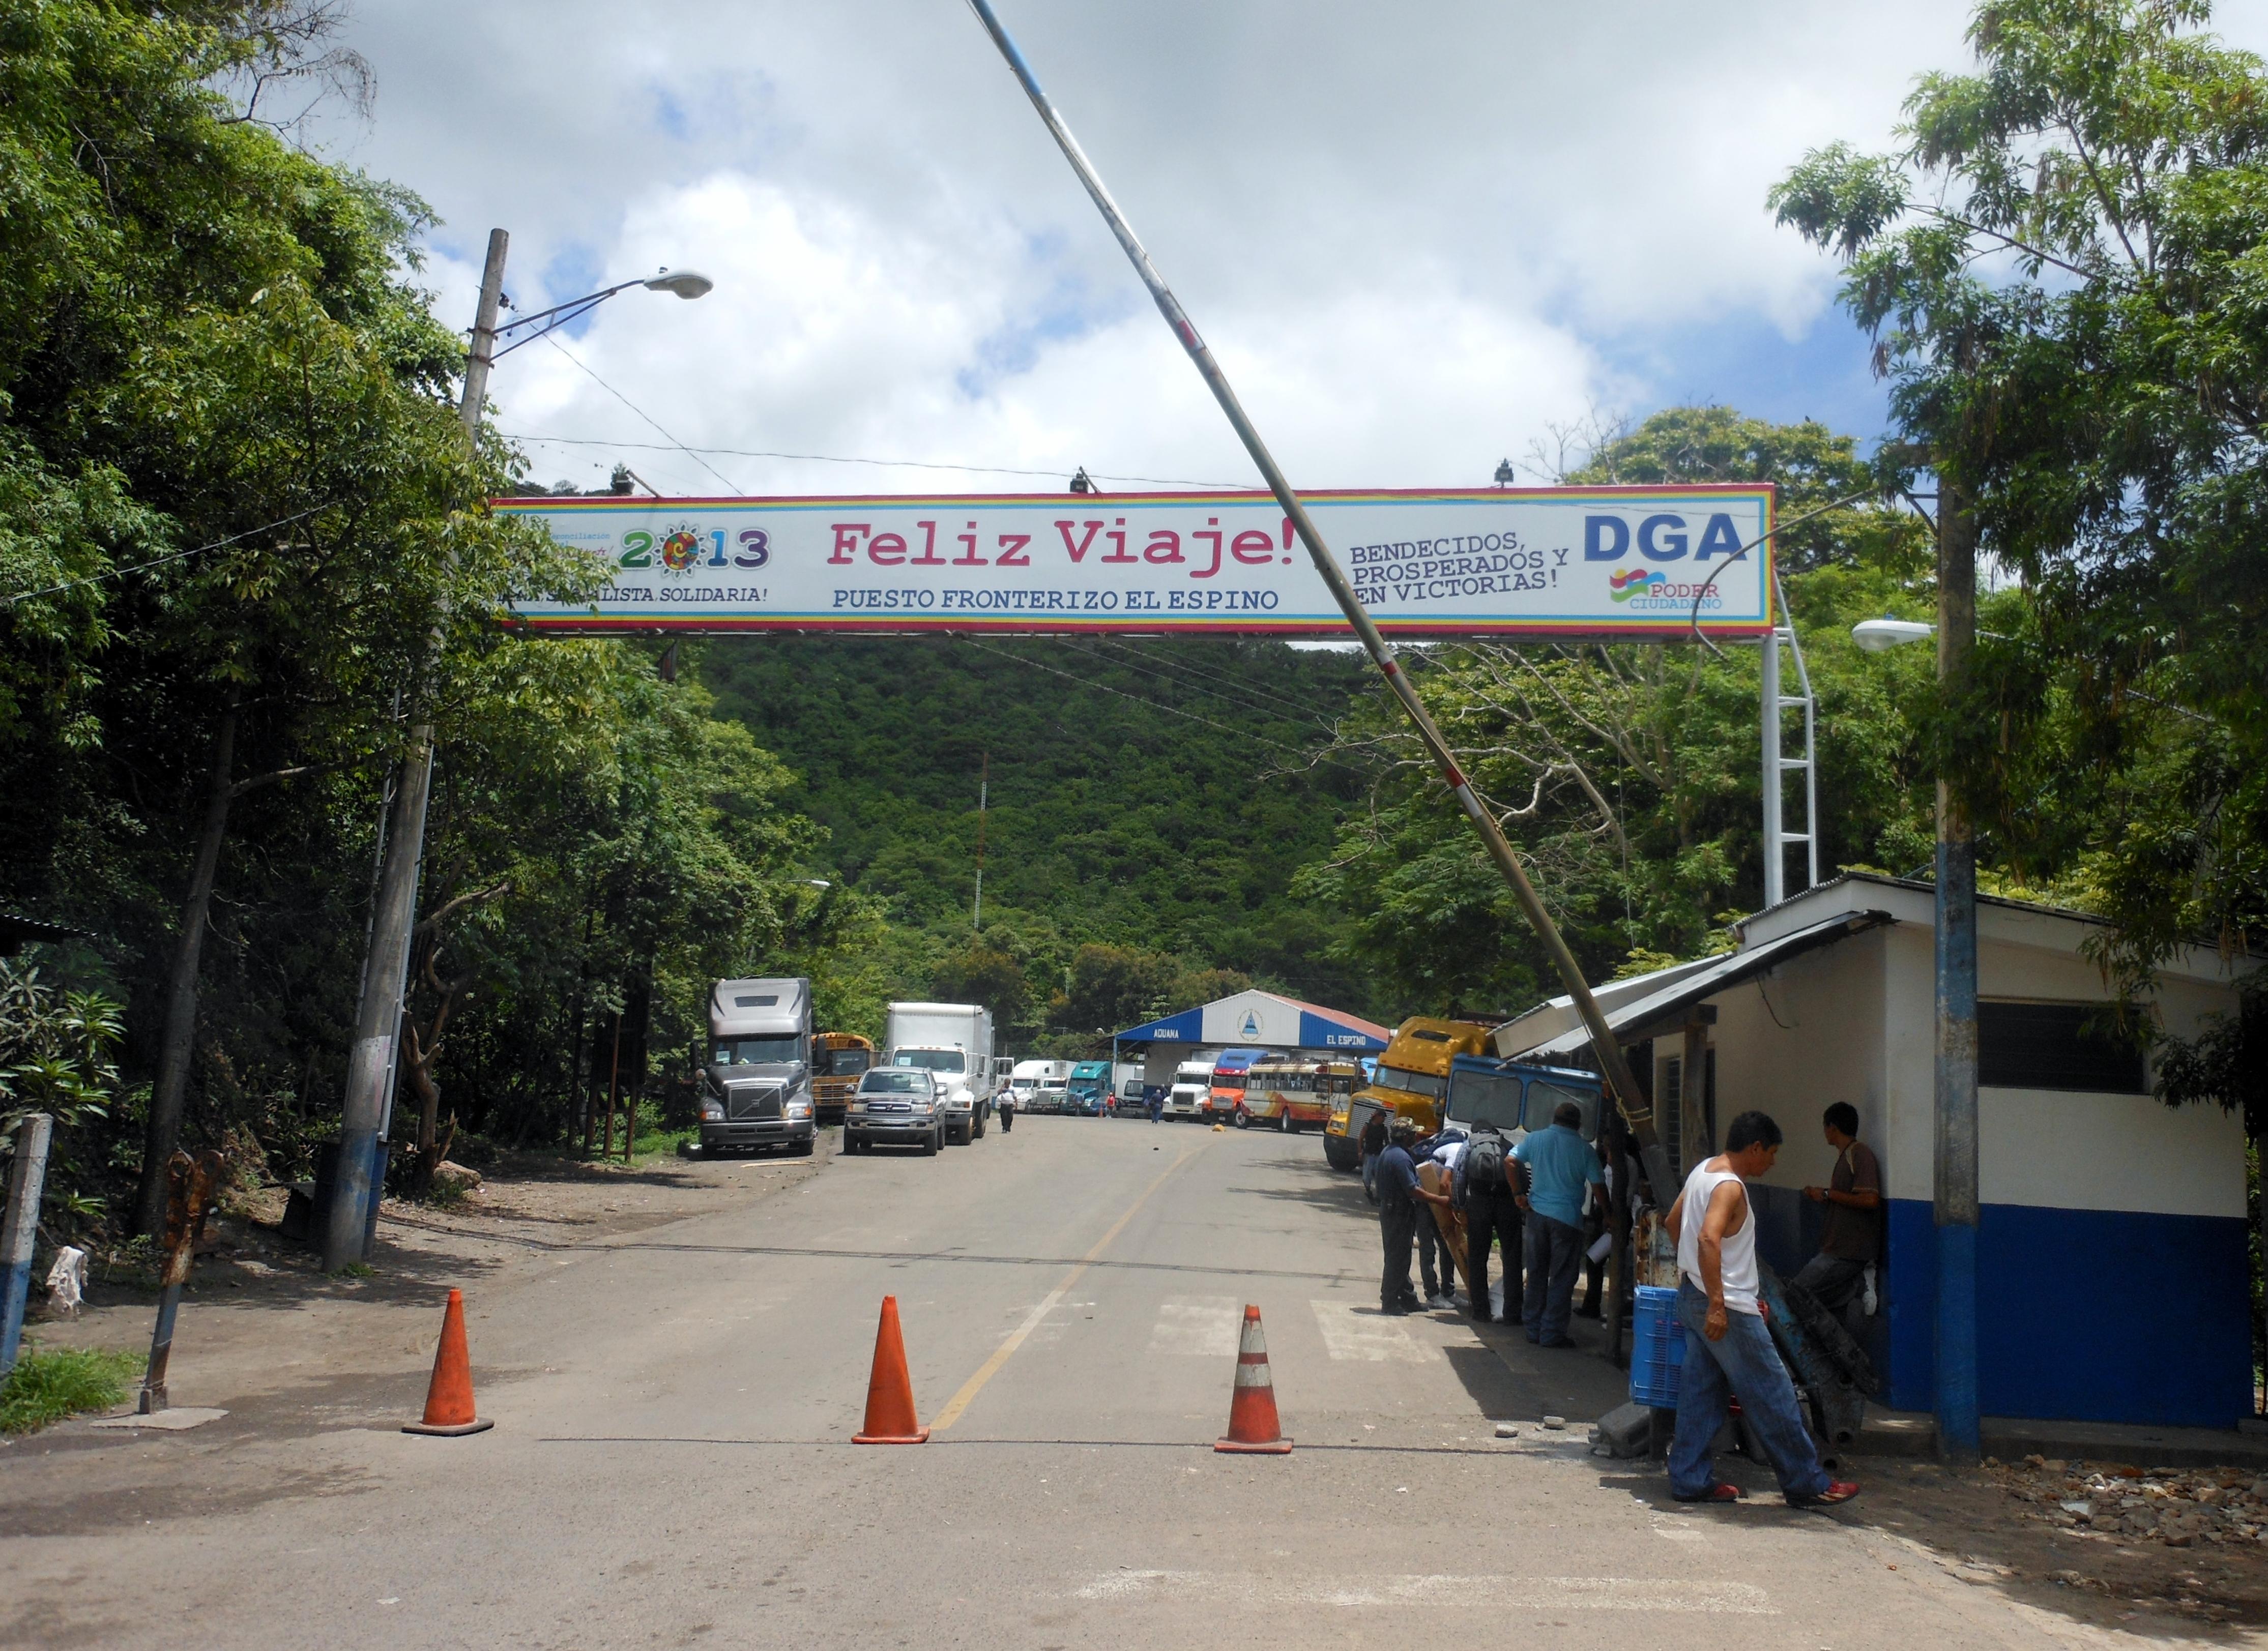 Exiting Nicaragua